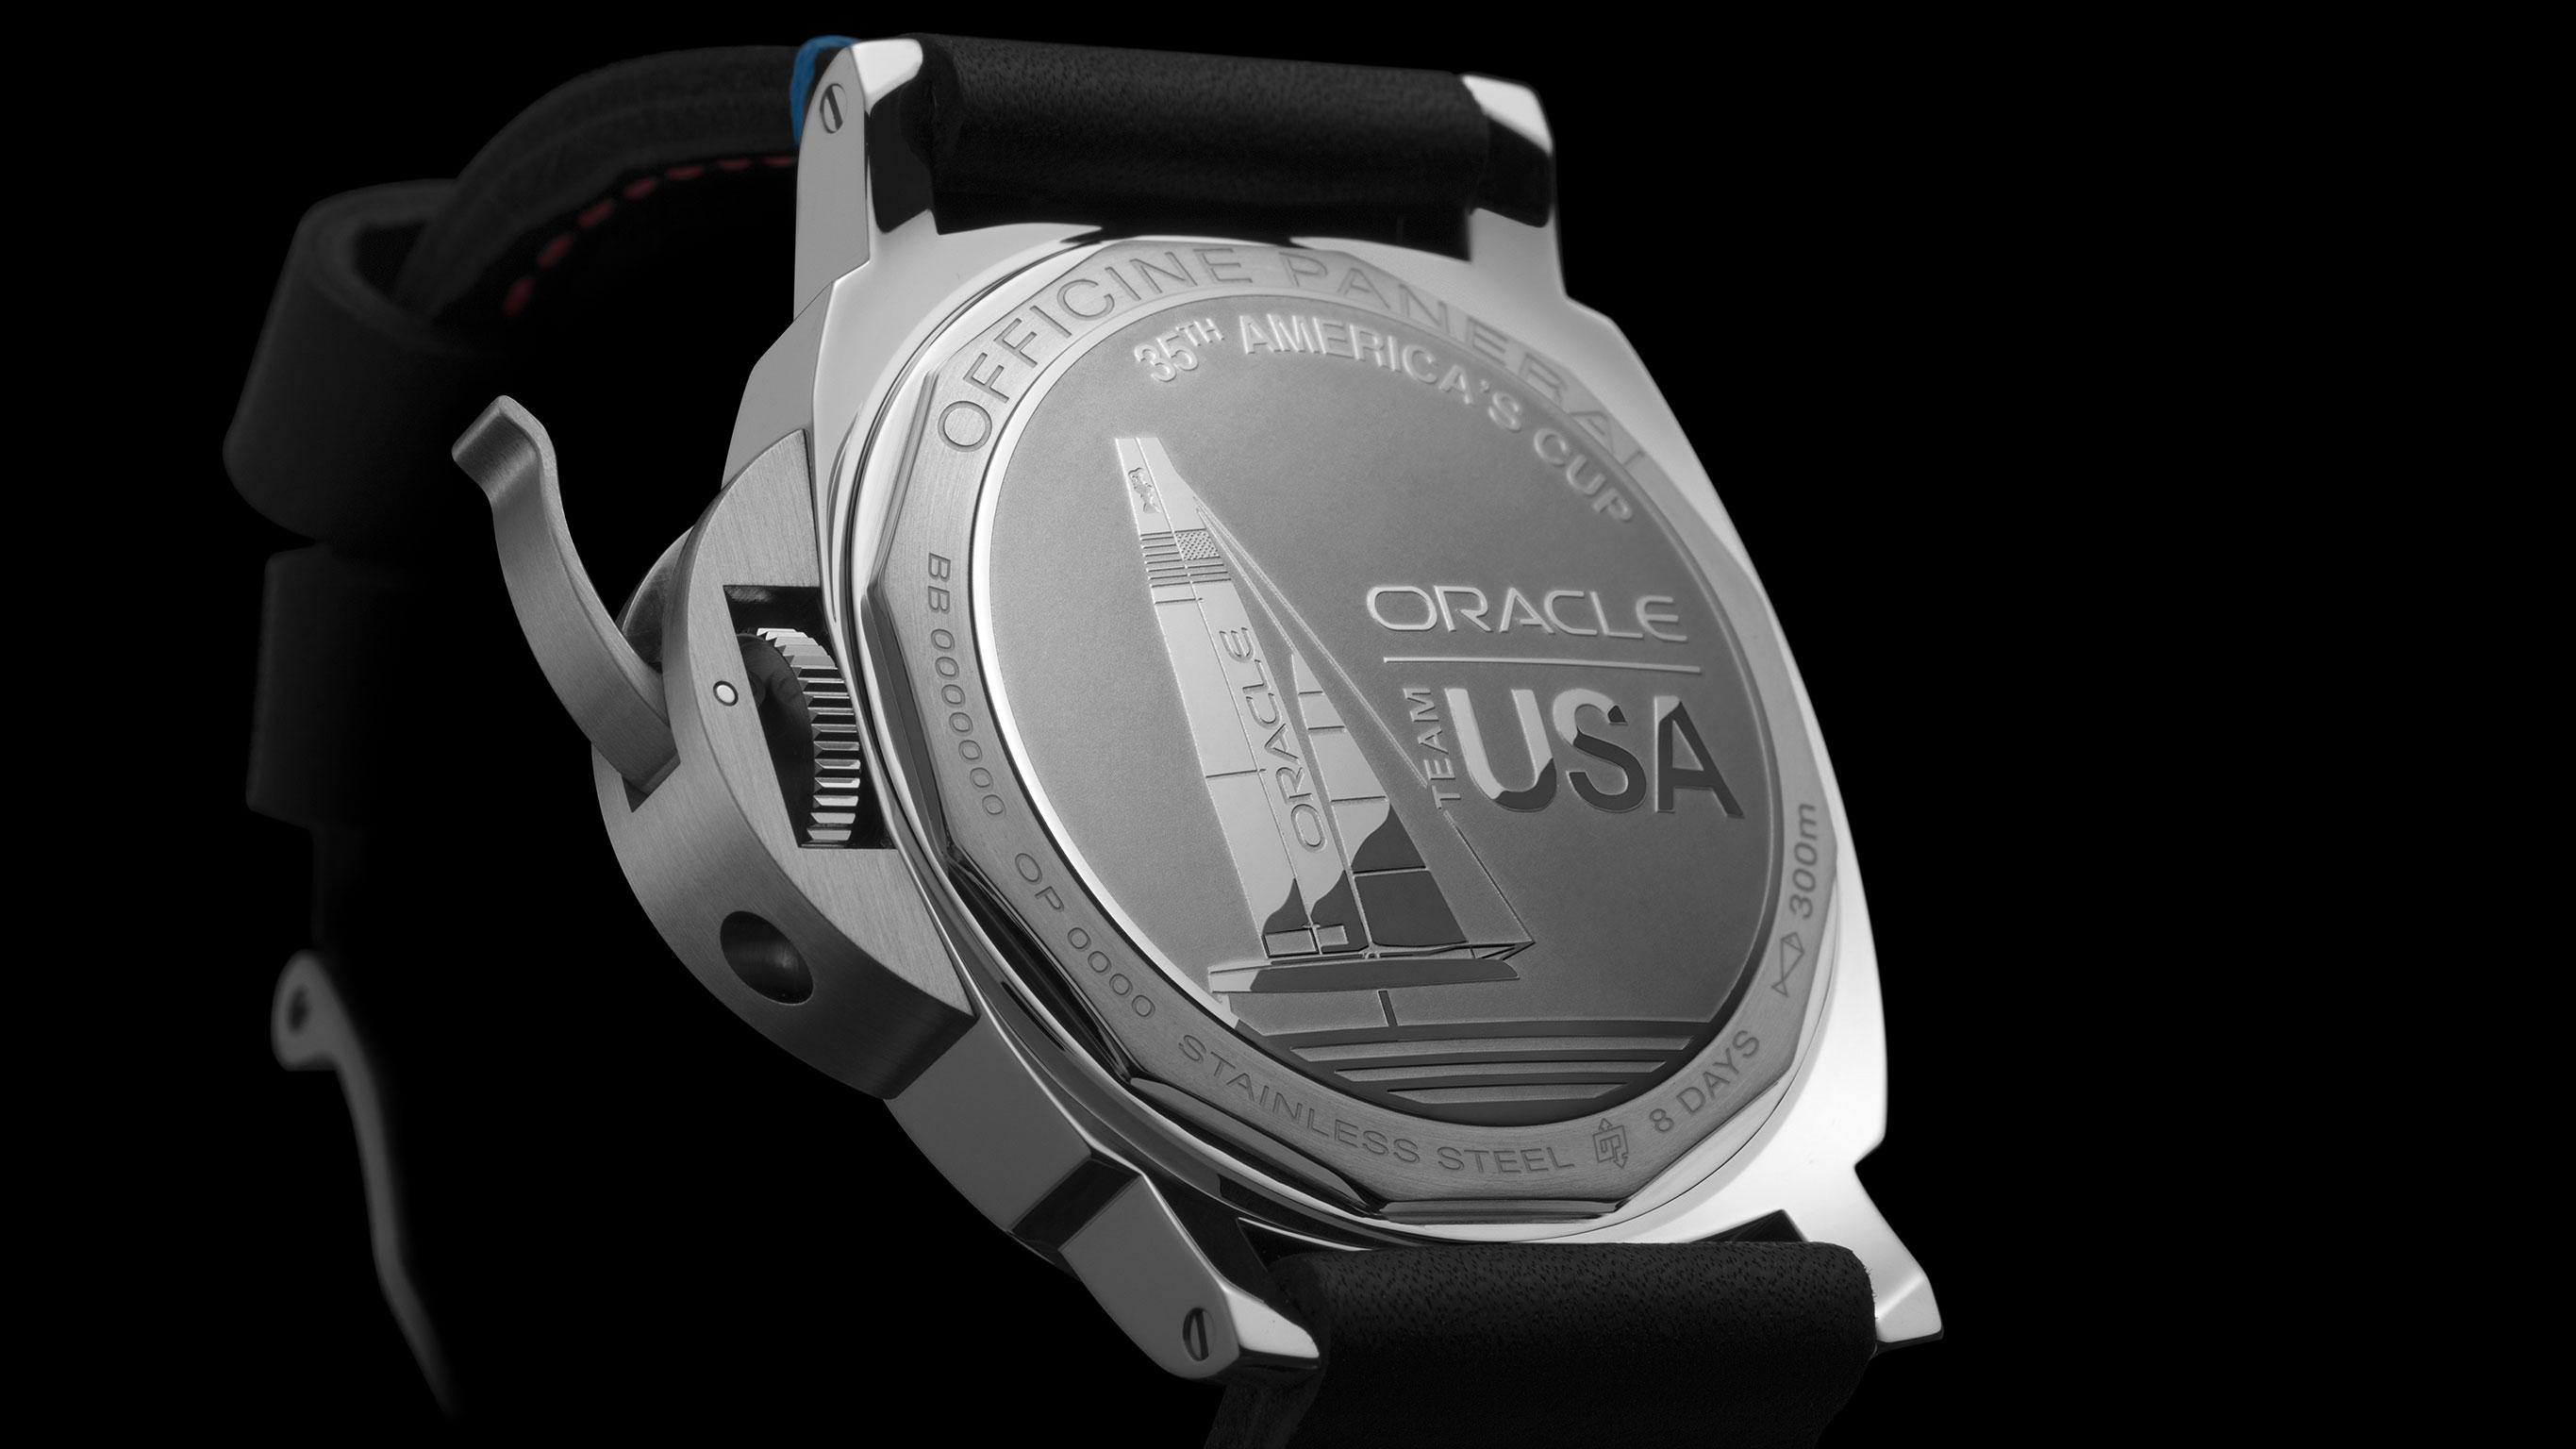 Panerai Luminor Marina ORACLE TEAM USA 8 Days PAM00724